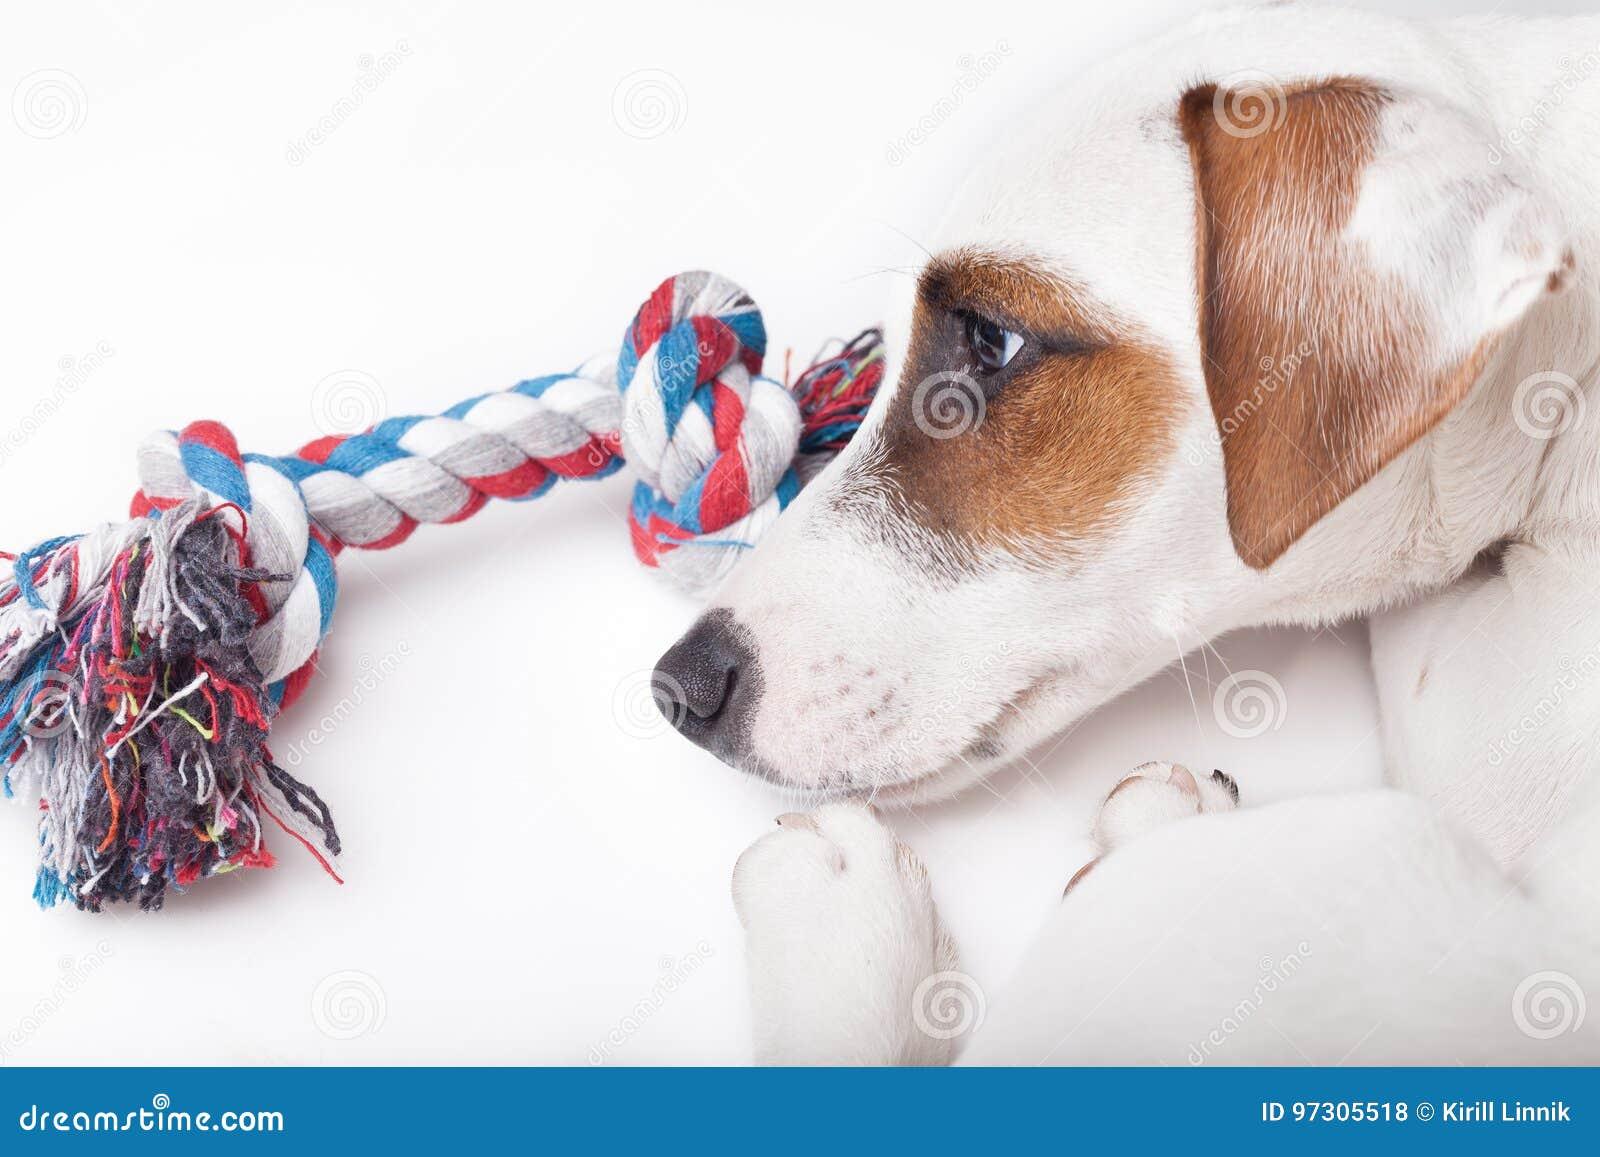 Download Sad and upset dog stock photo. Image of purebred, breed - 97305518